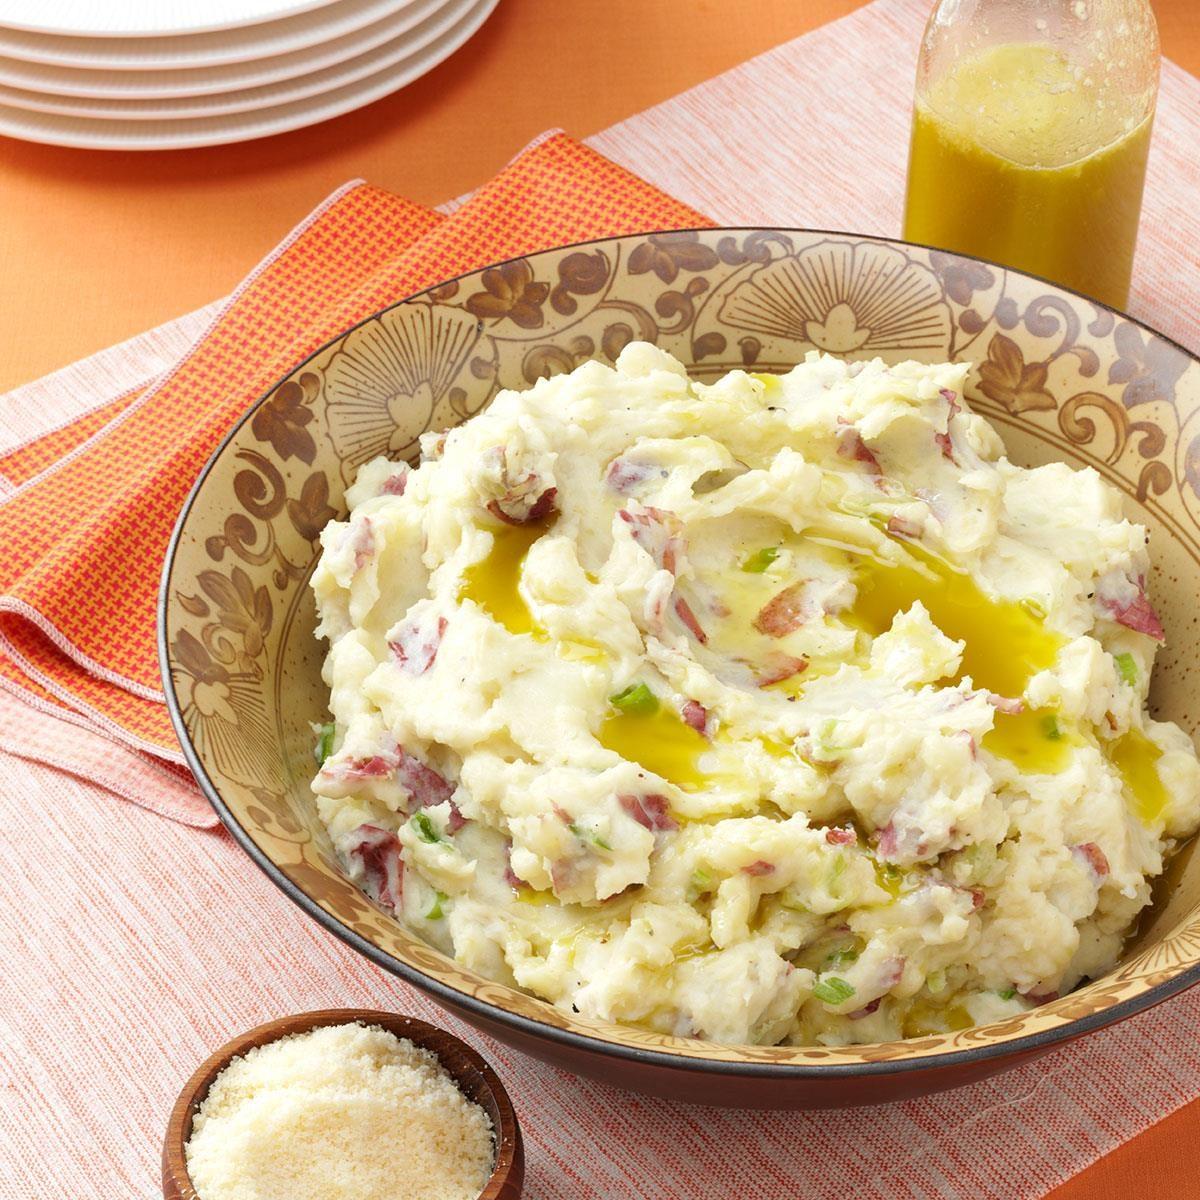 Test Kitchen Mashed Potatoes